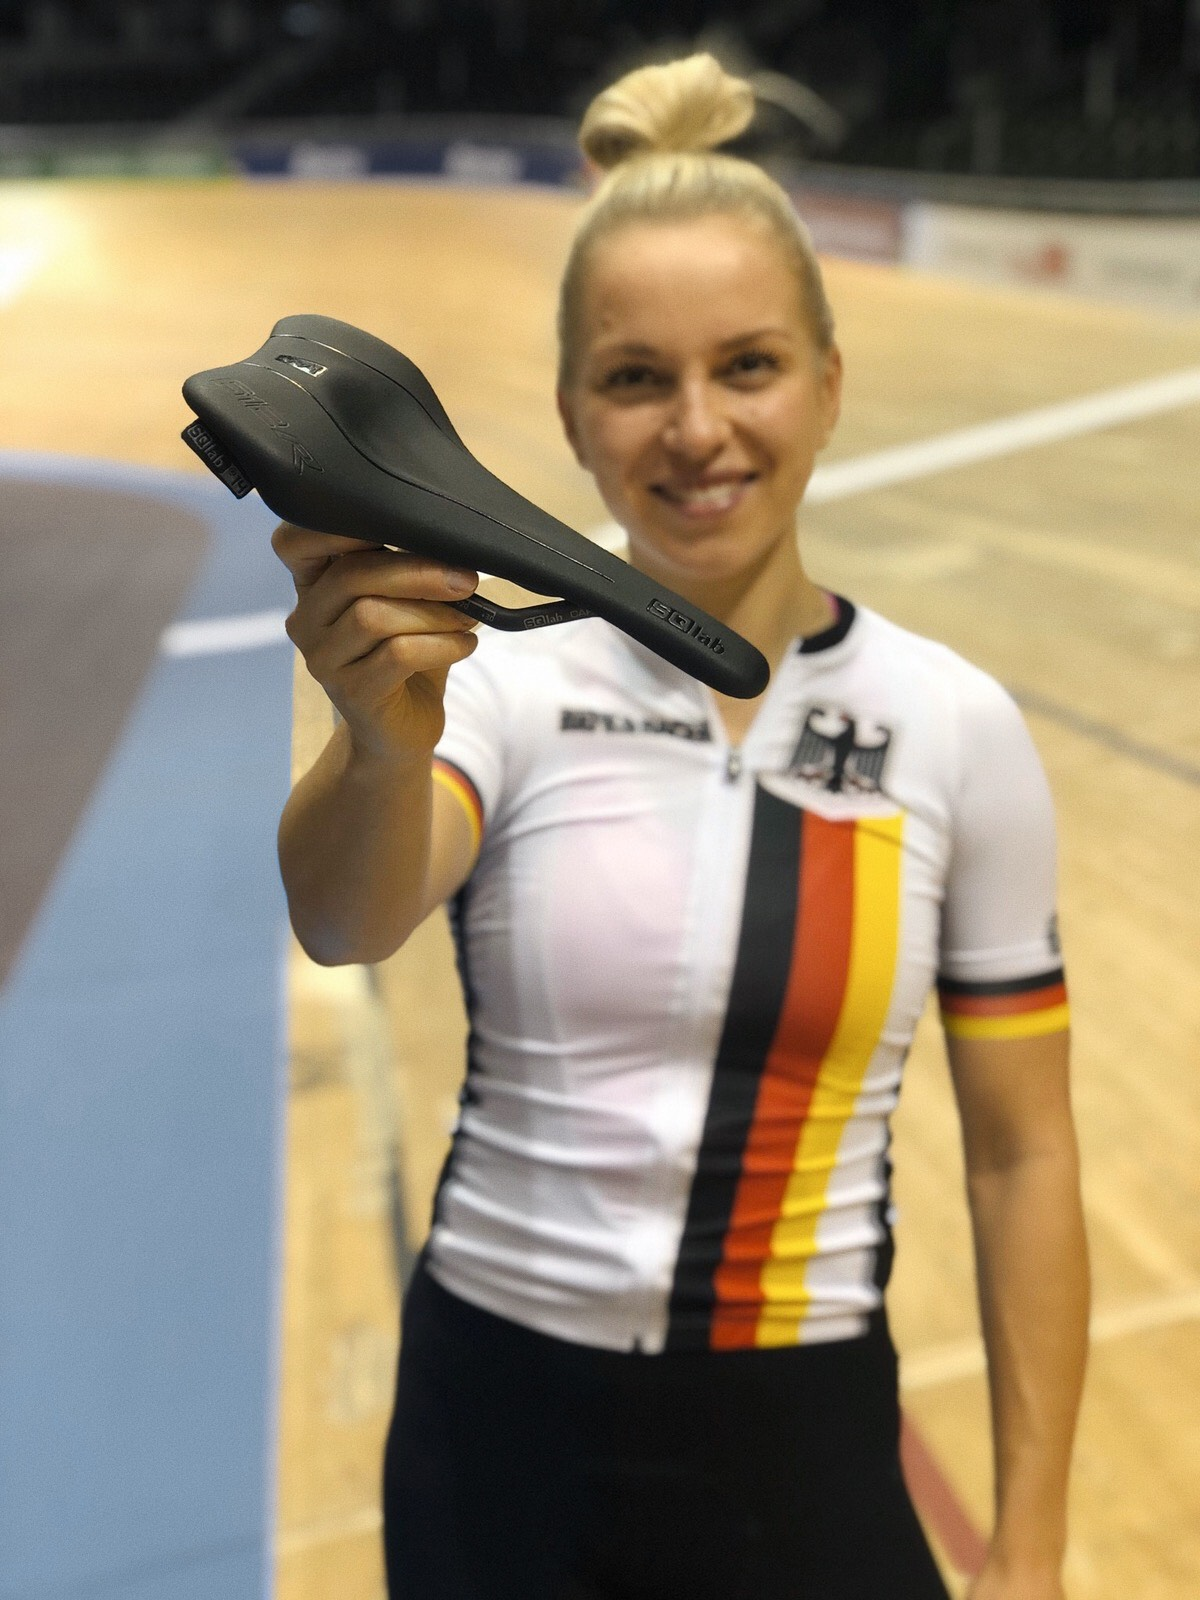 Emma Hinze  3x Elite World Champion